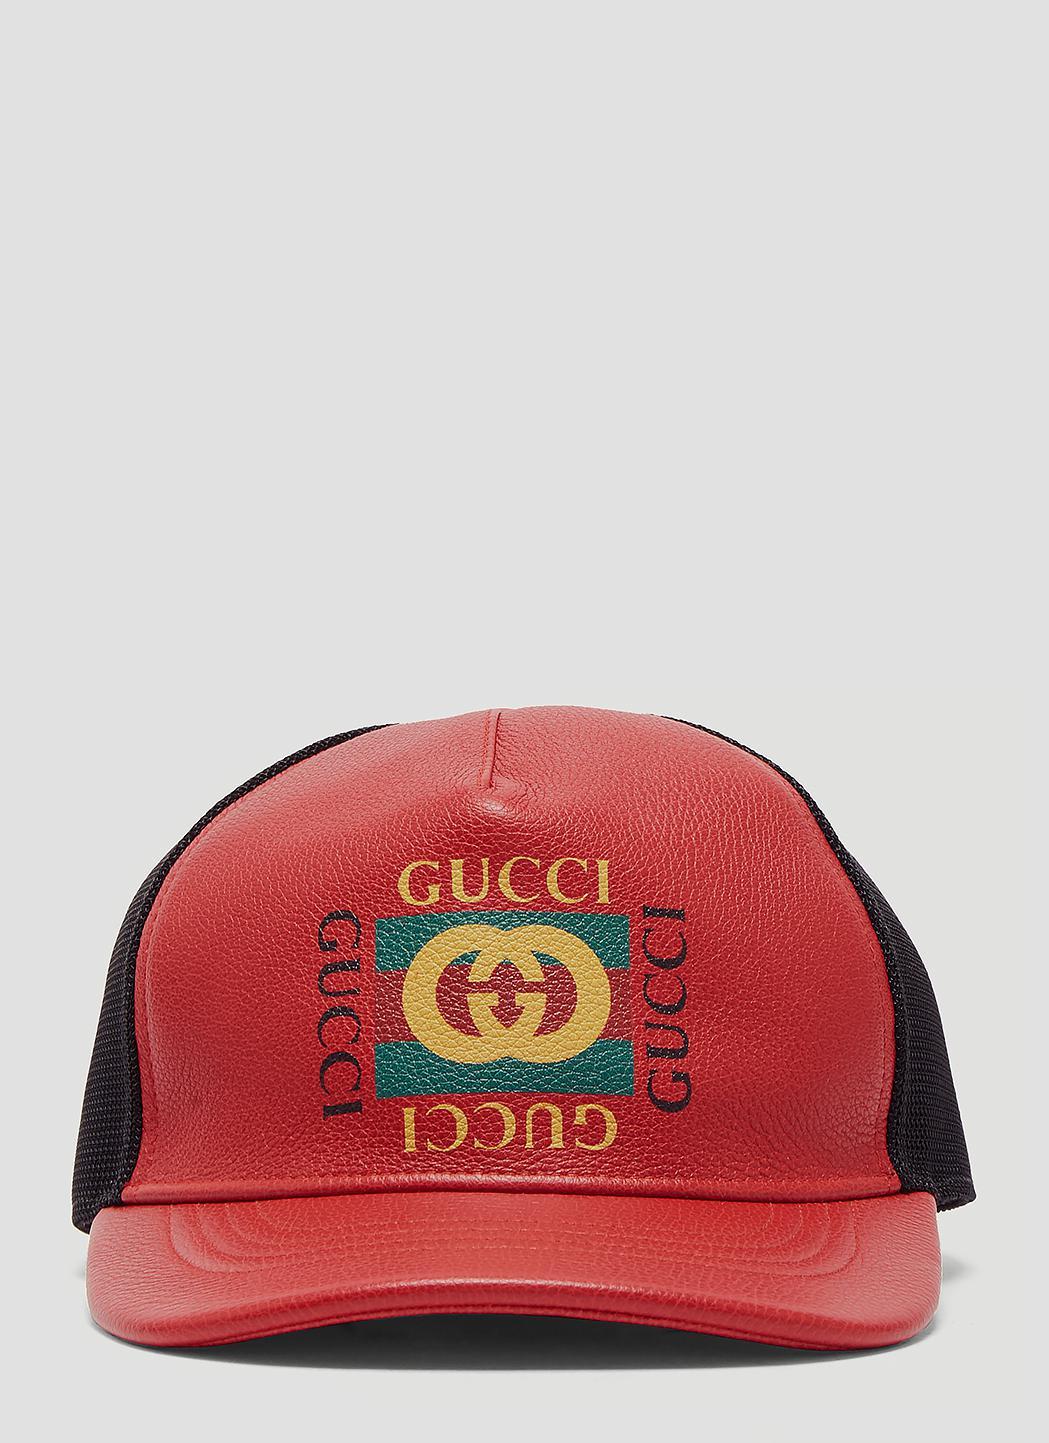 42f81de1 Gucci - Logo Print Leather Baseball Hat In Red for Men - Lyst. View  fullscreen